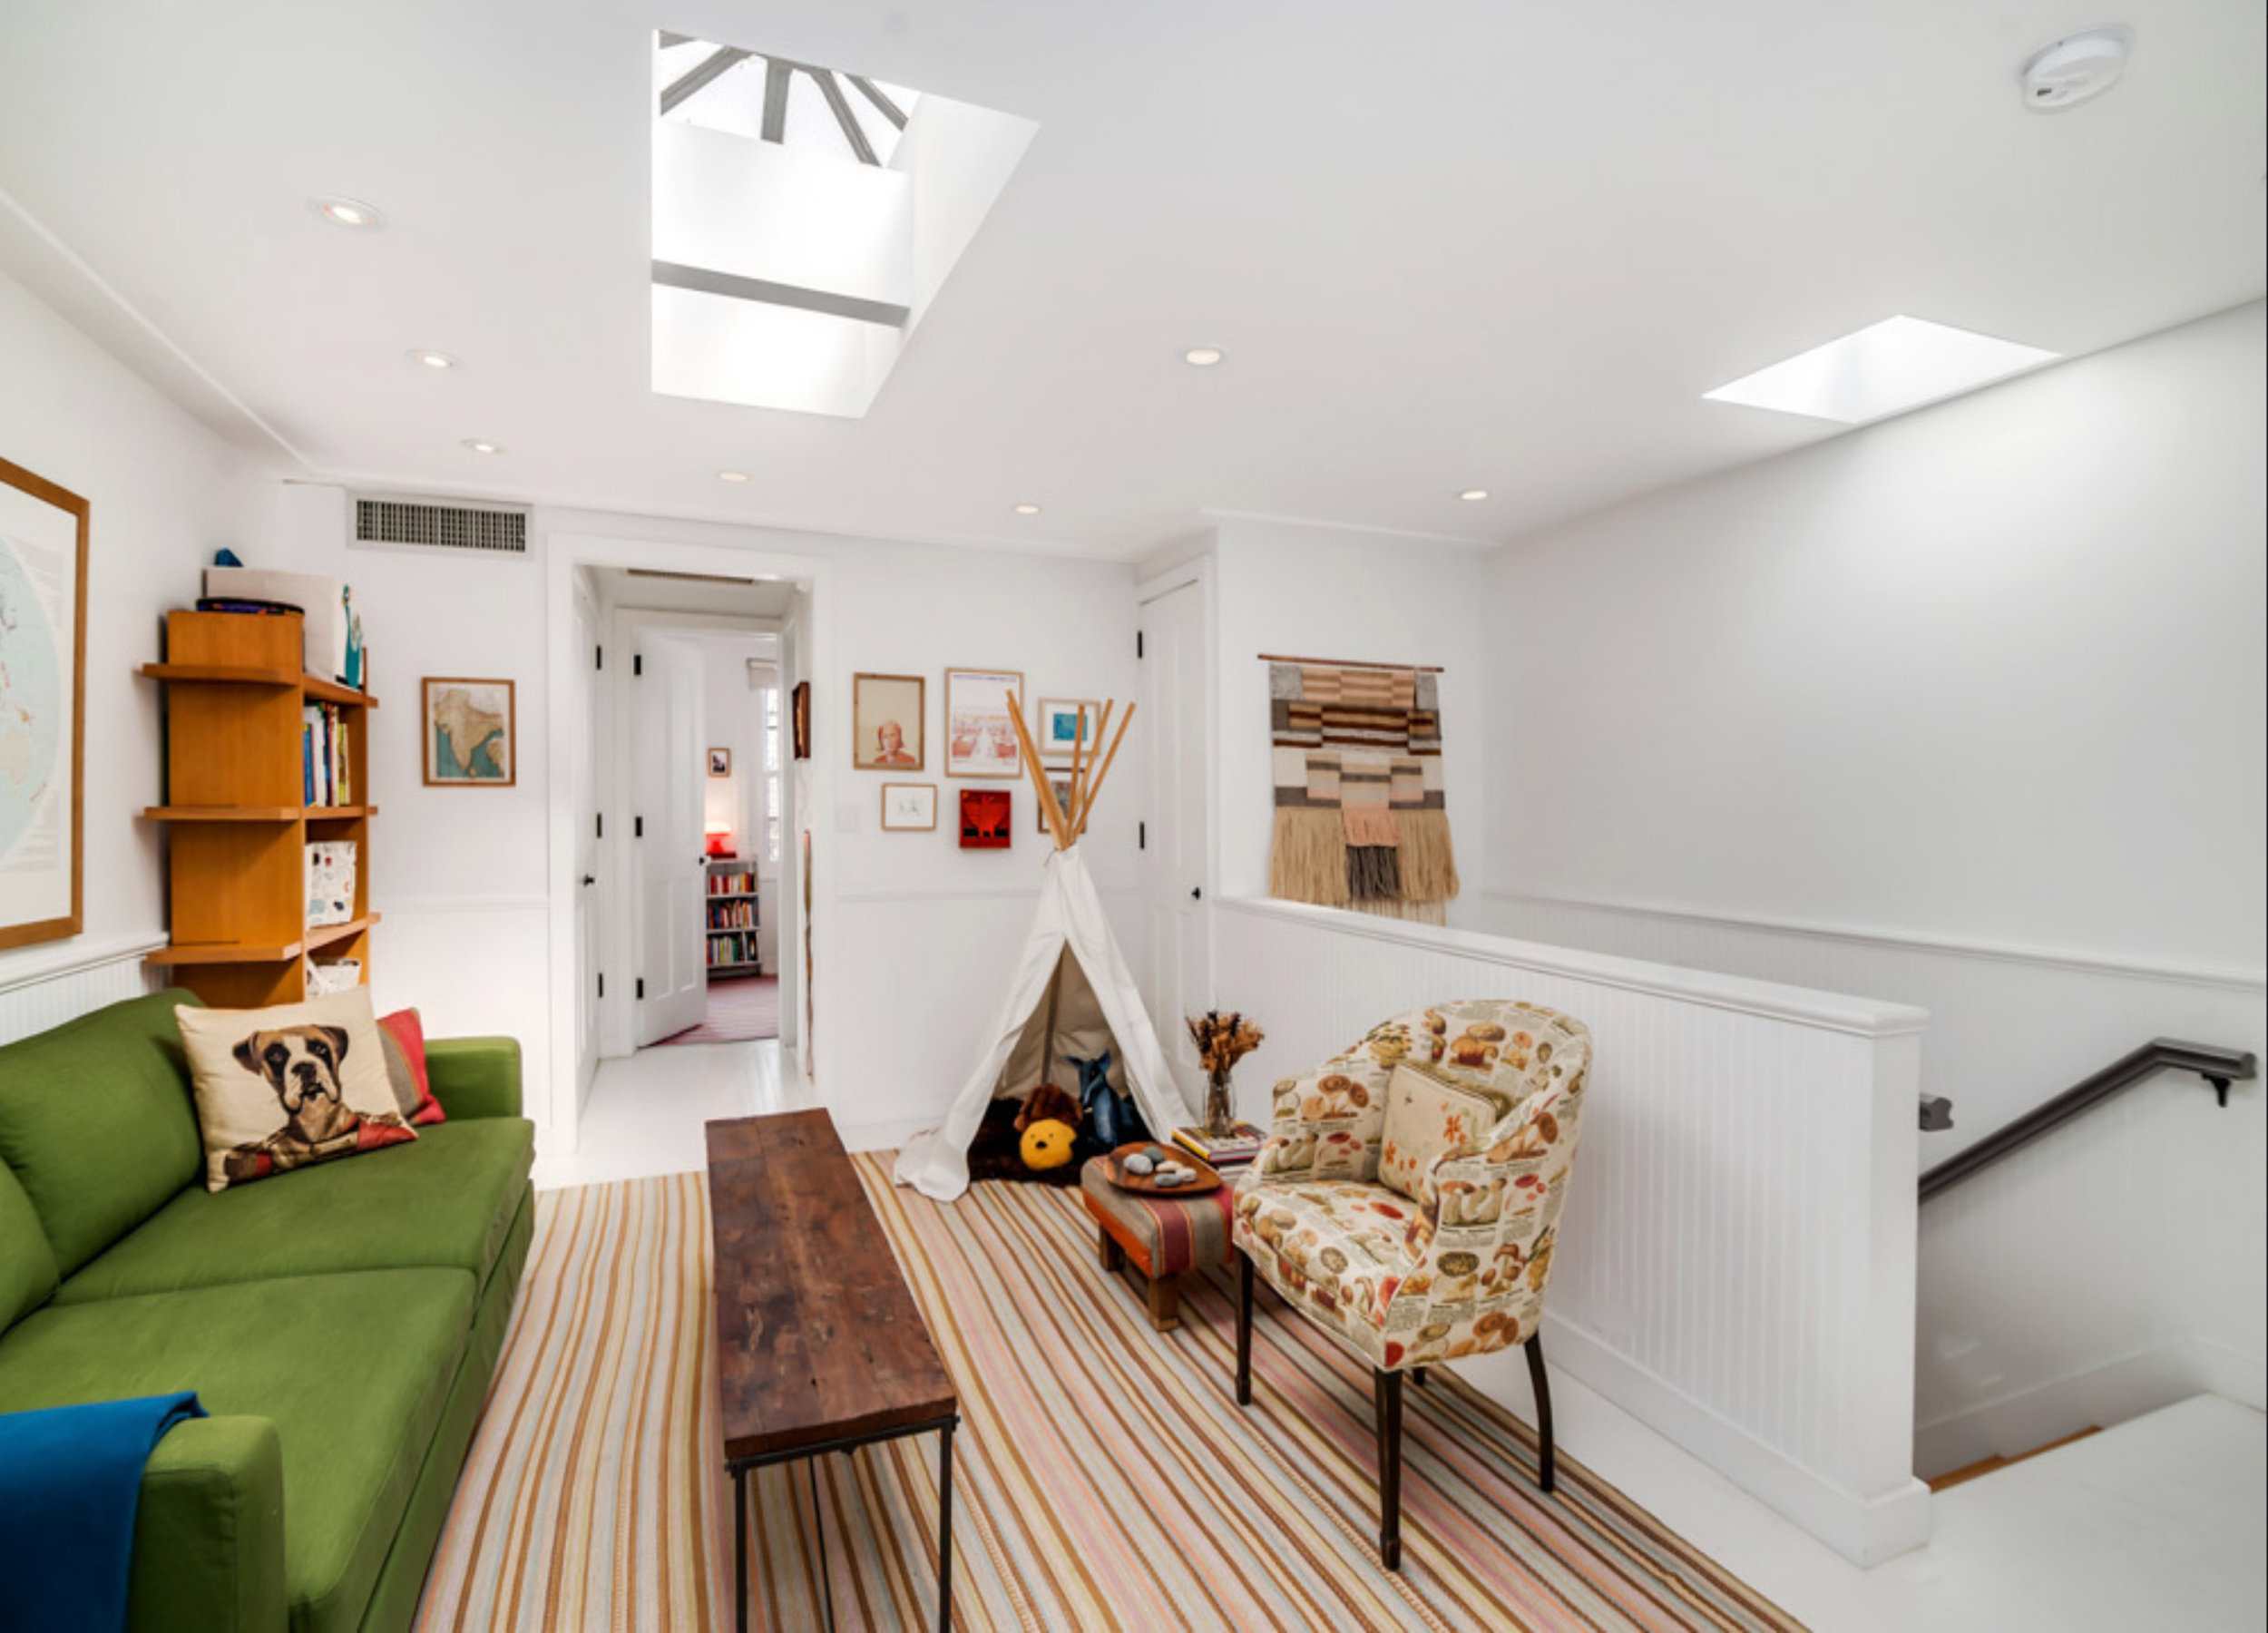 338 Metropolitan Ave, Single Family   Williamsburg, Brooklyn   $2,250,000  3 Beds | 2.5 Baths | 2,016 SF